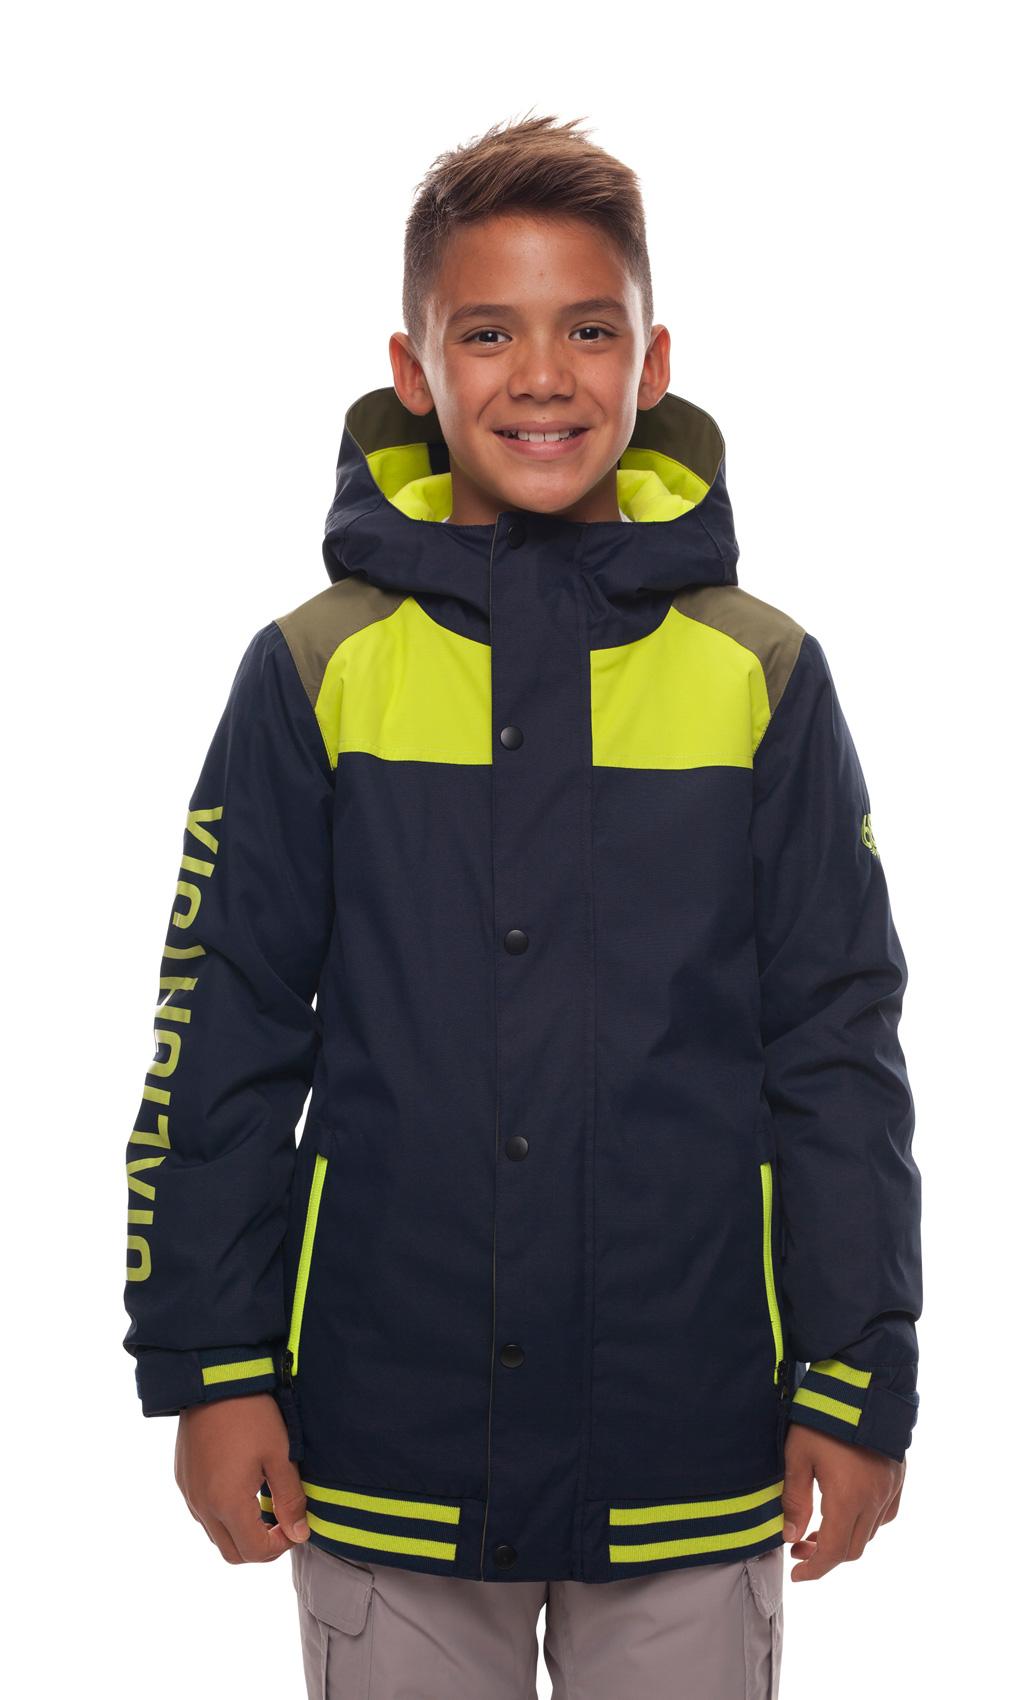 08609db0c 686 Boys Captain Insulated Jacket 2018